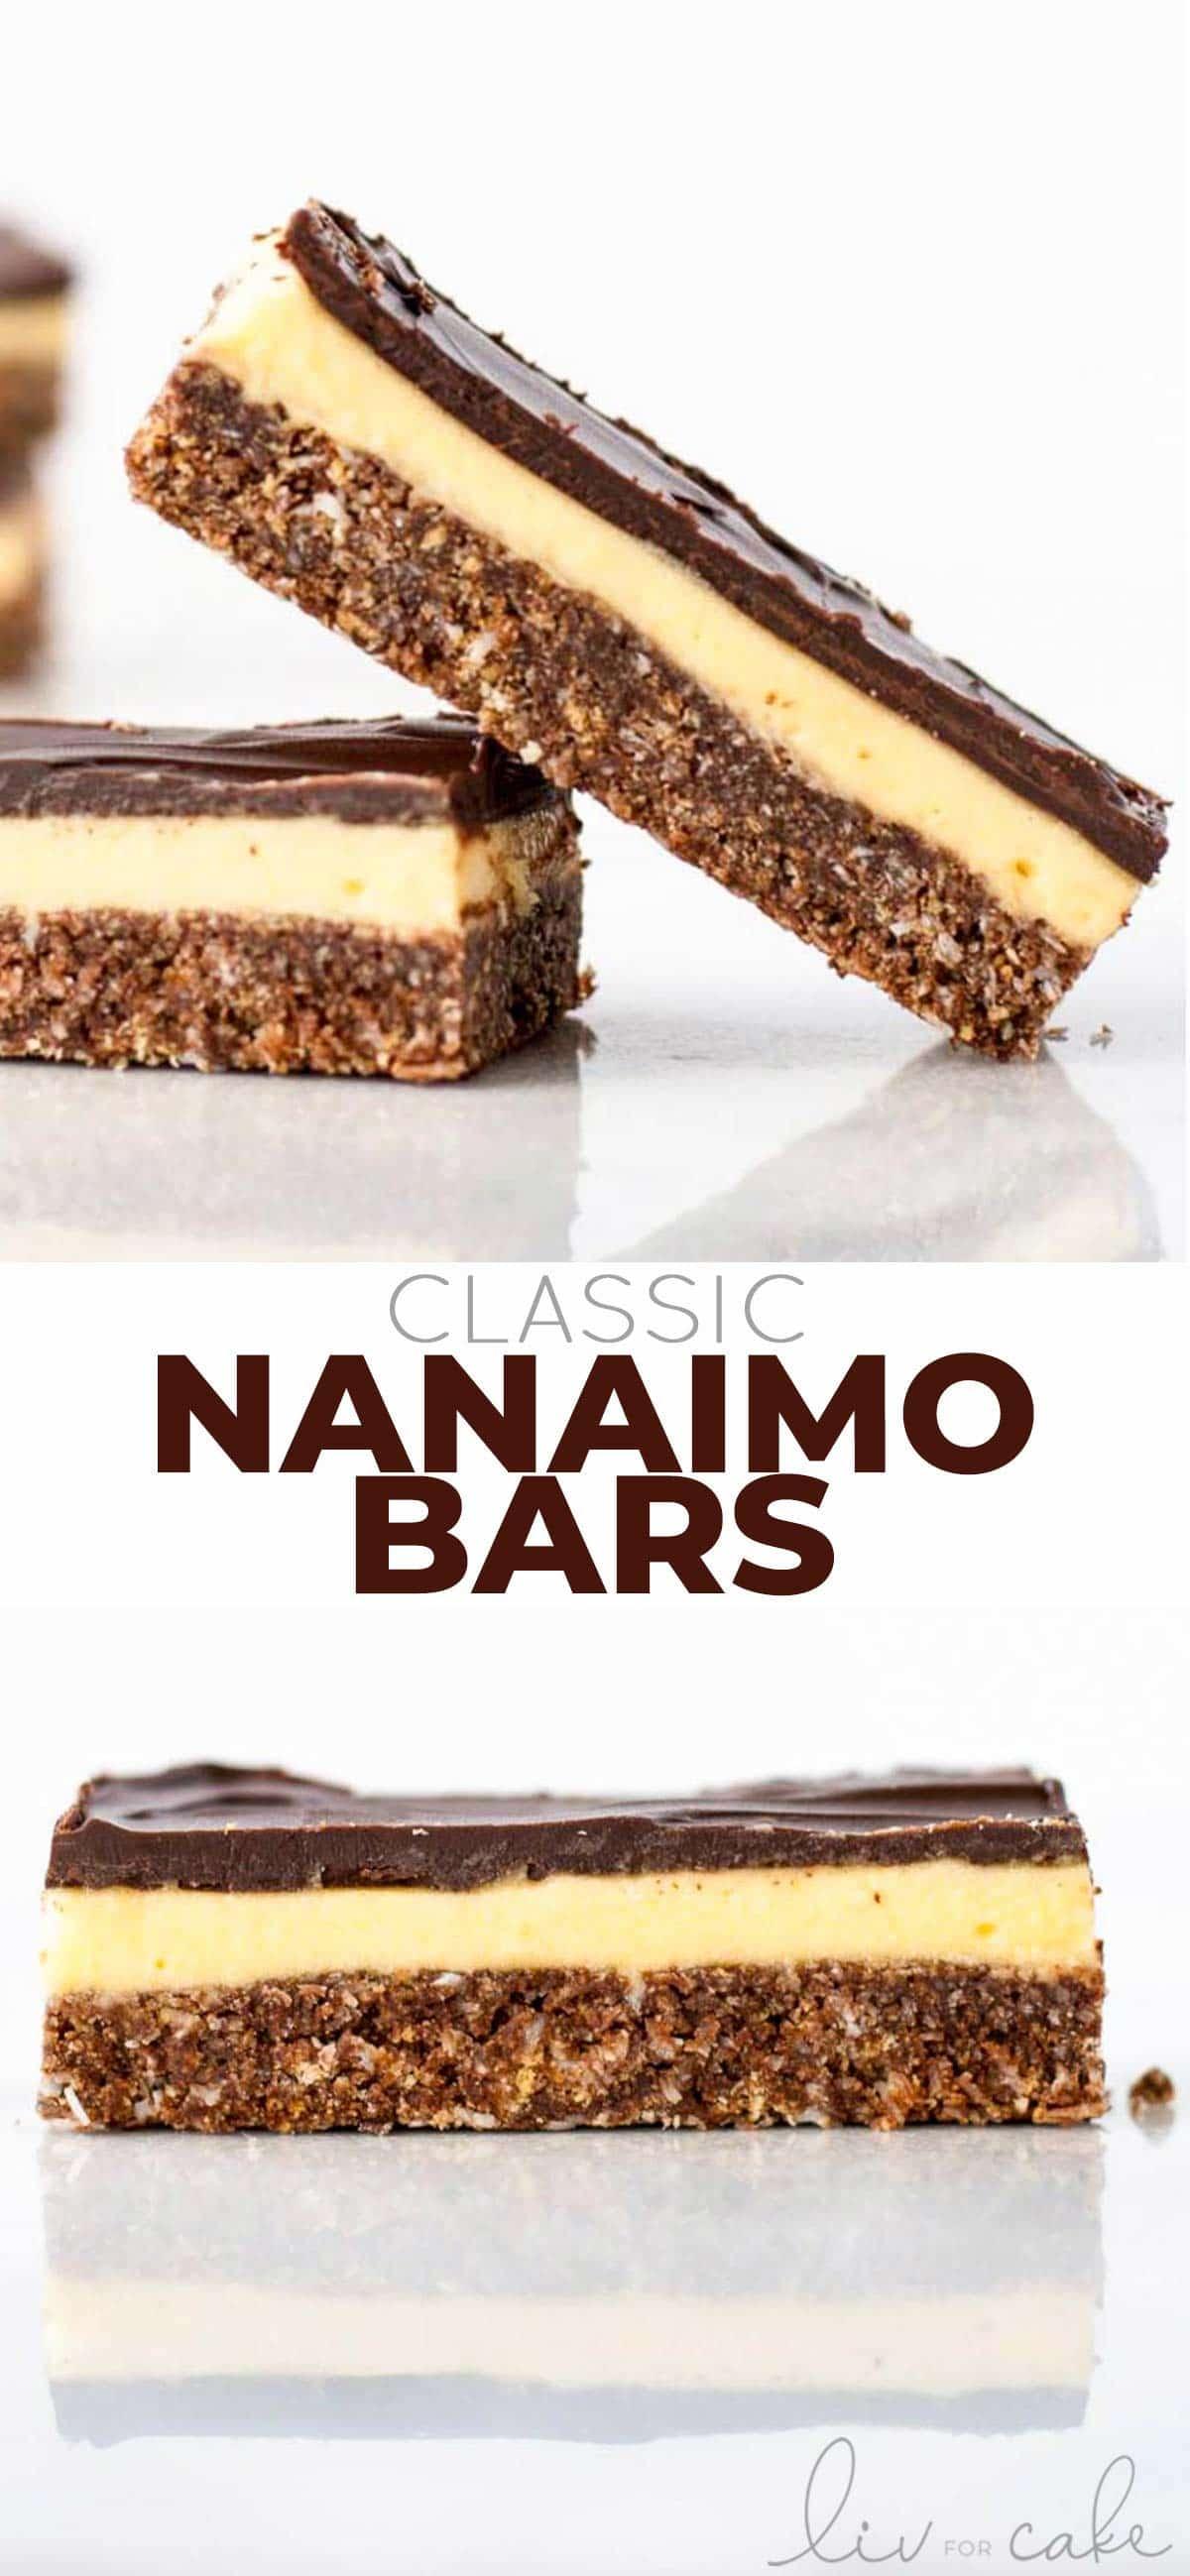 Nanaimo bar photo collage